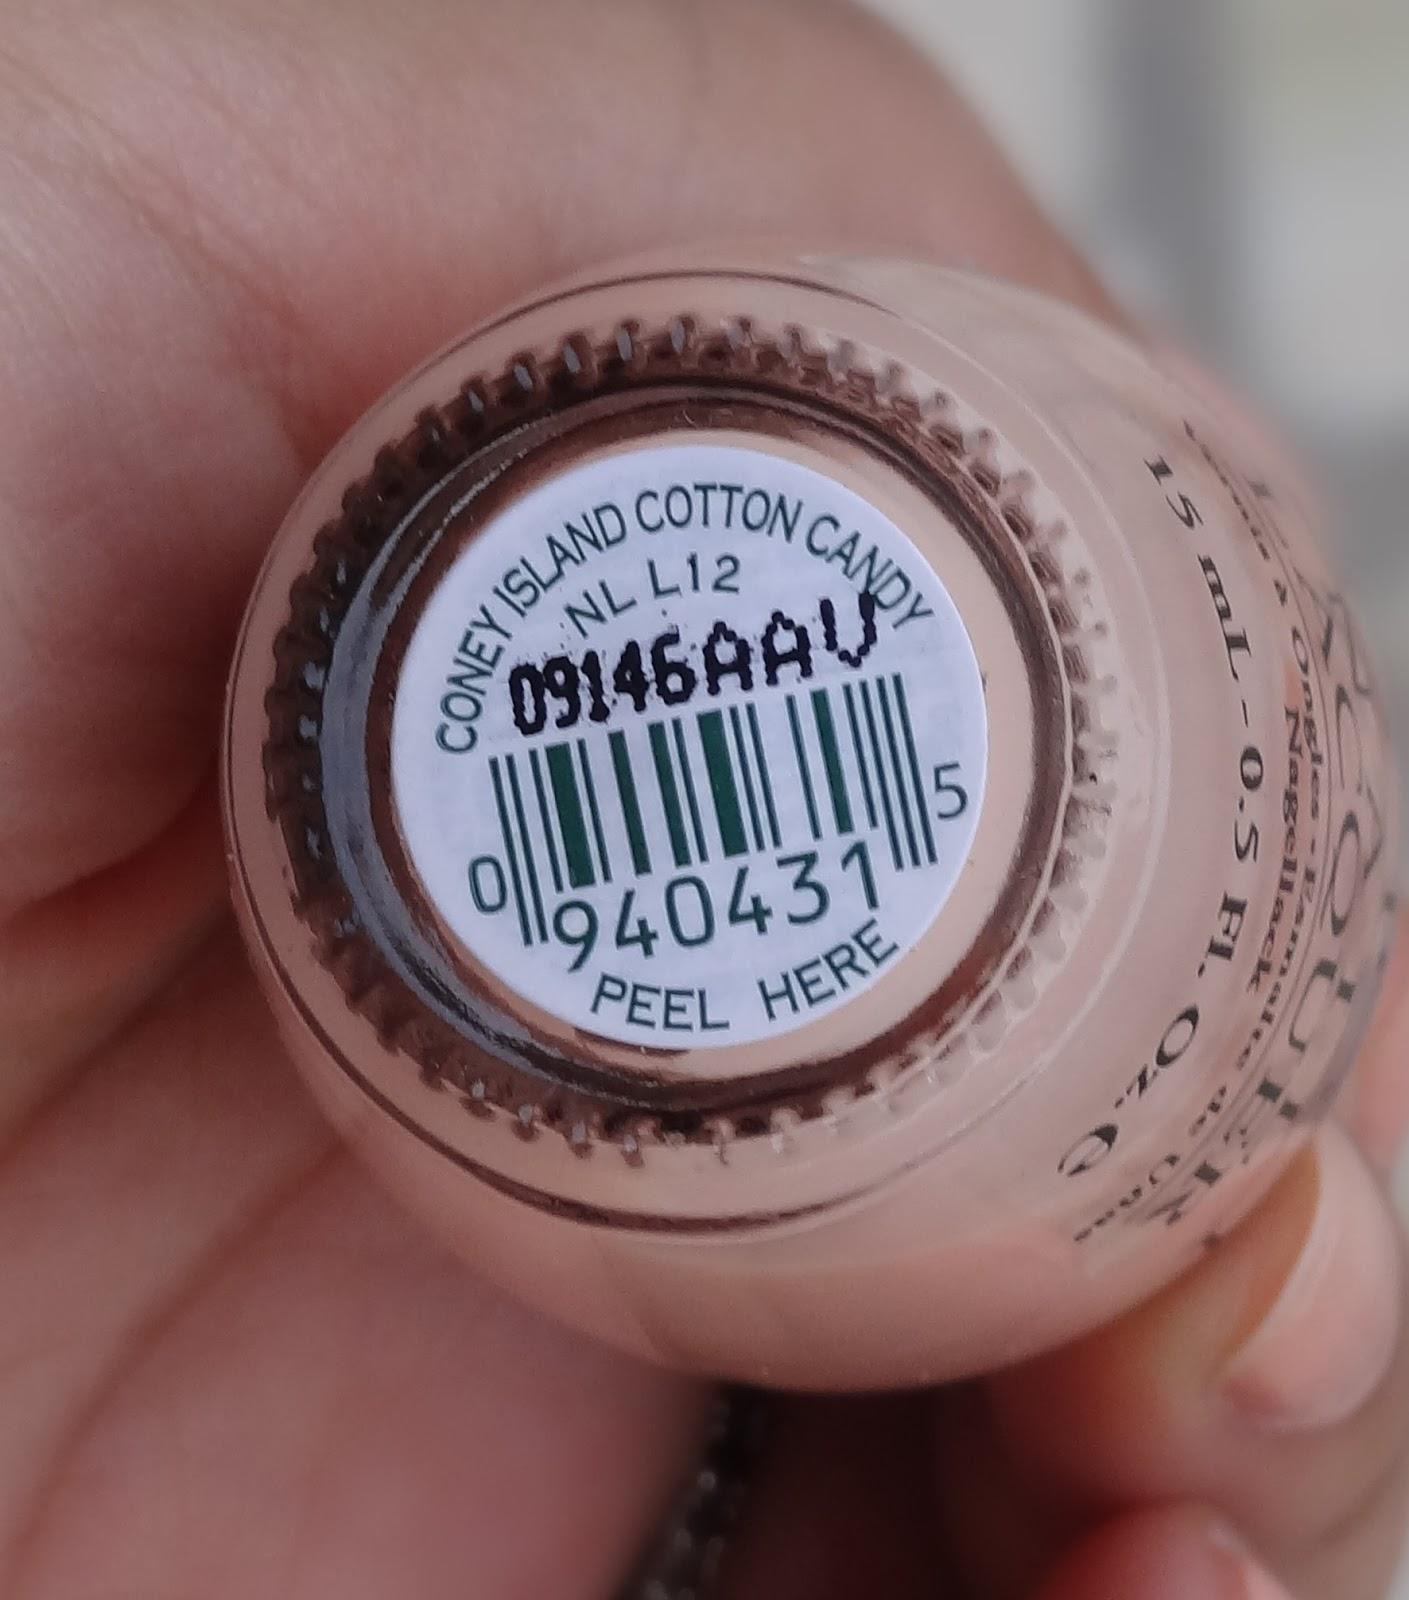 Cotton Candy Nail Polish Opi: O.P.I Coney Island Cotton Candy Swatches, Photos